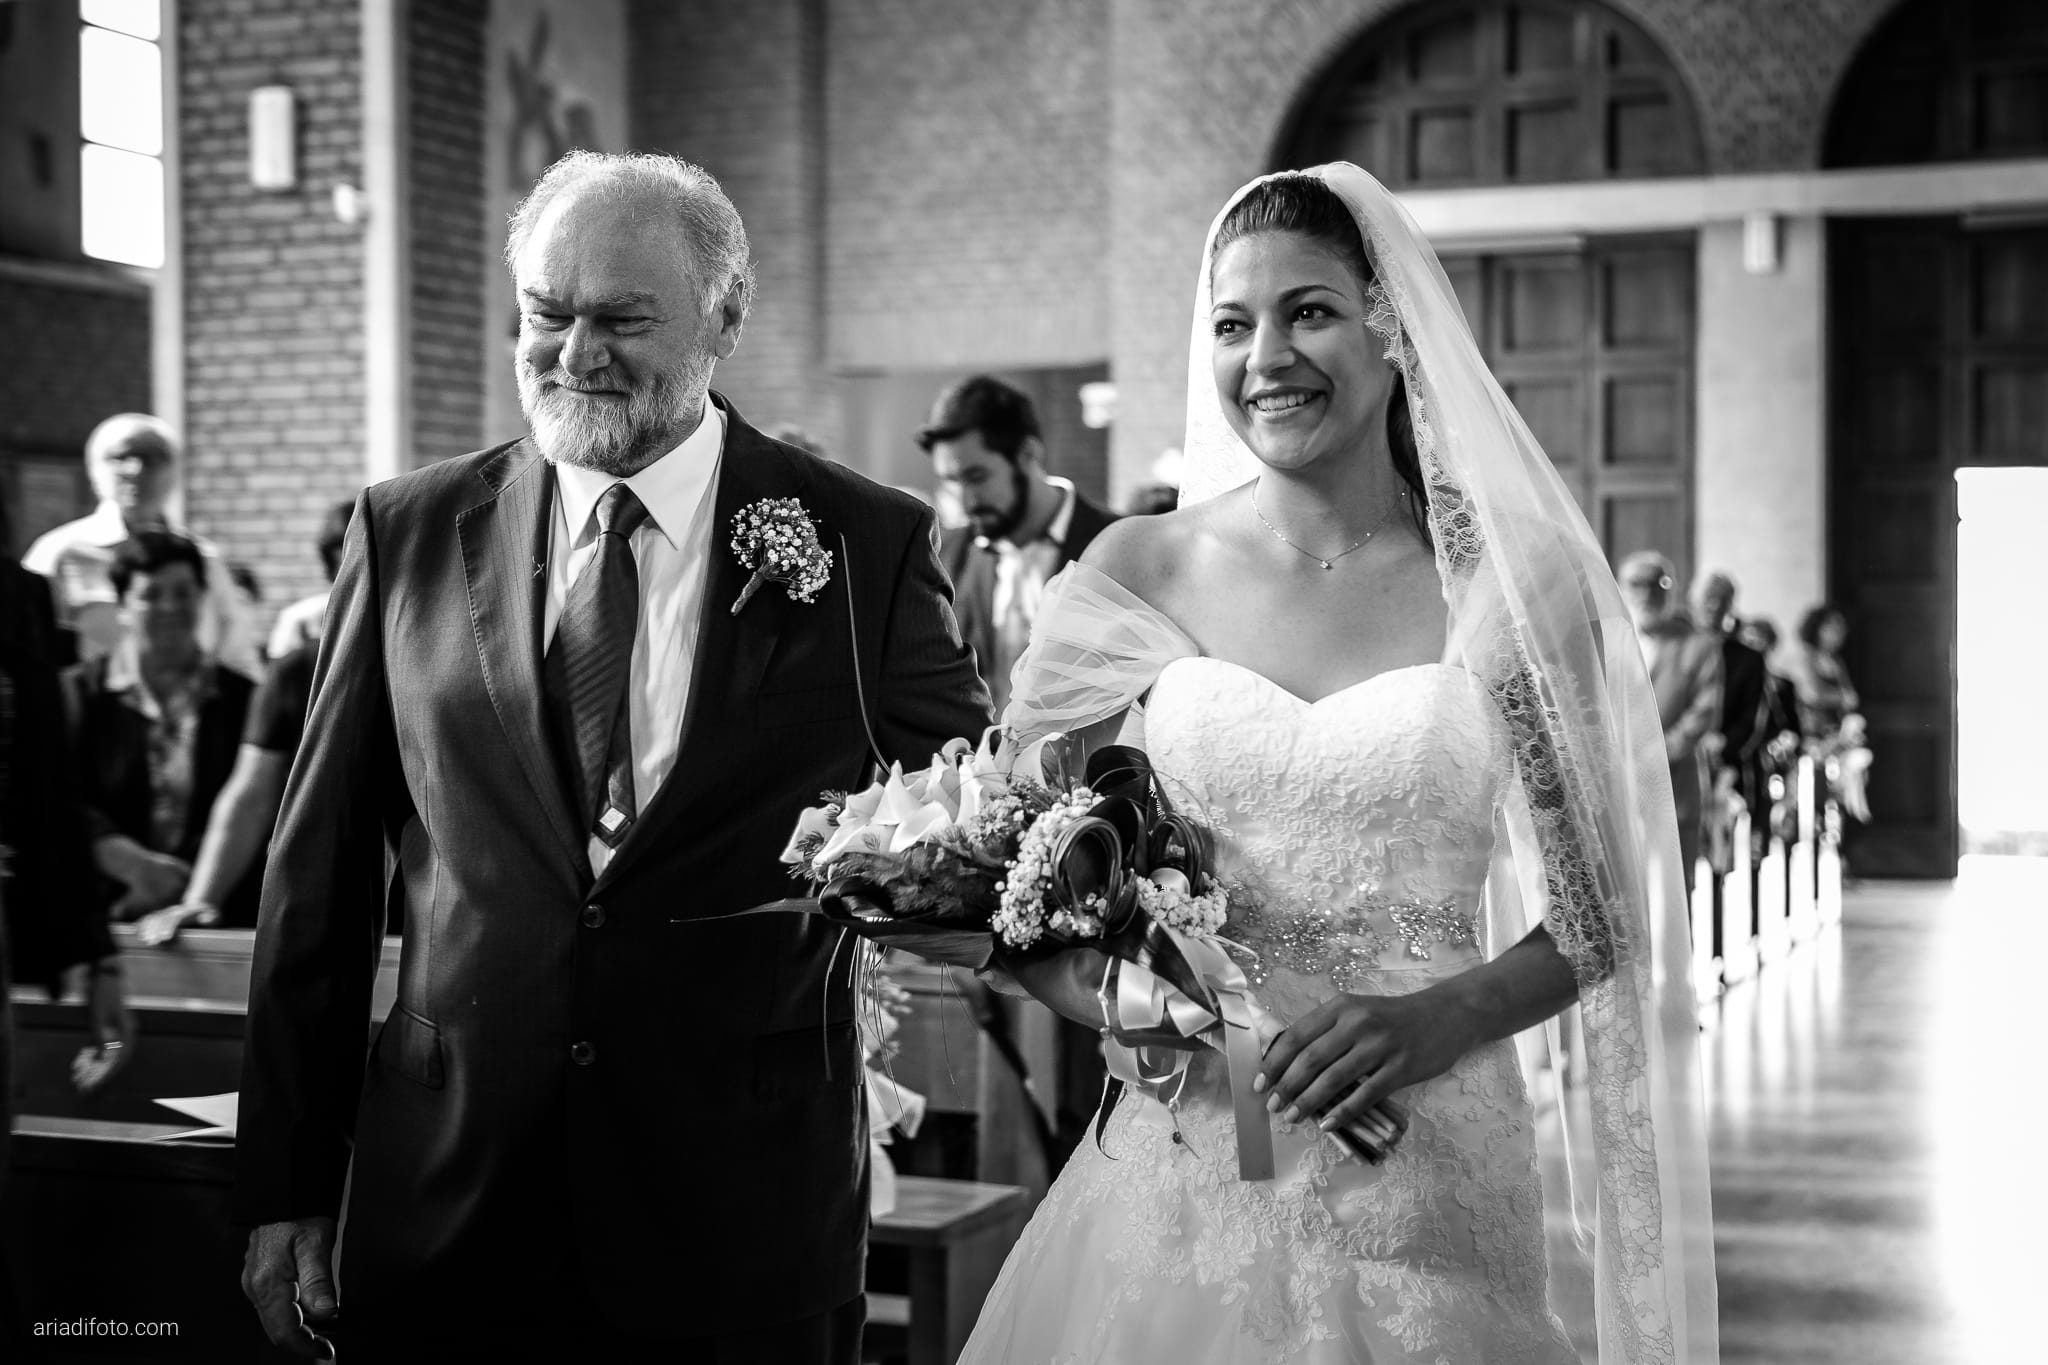 Fiordaliso Andrea matrimonio Salvia Rosmarino Trieste cerimonia ingresso sposa Beata Vergine delle Grazie